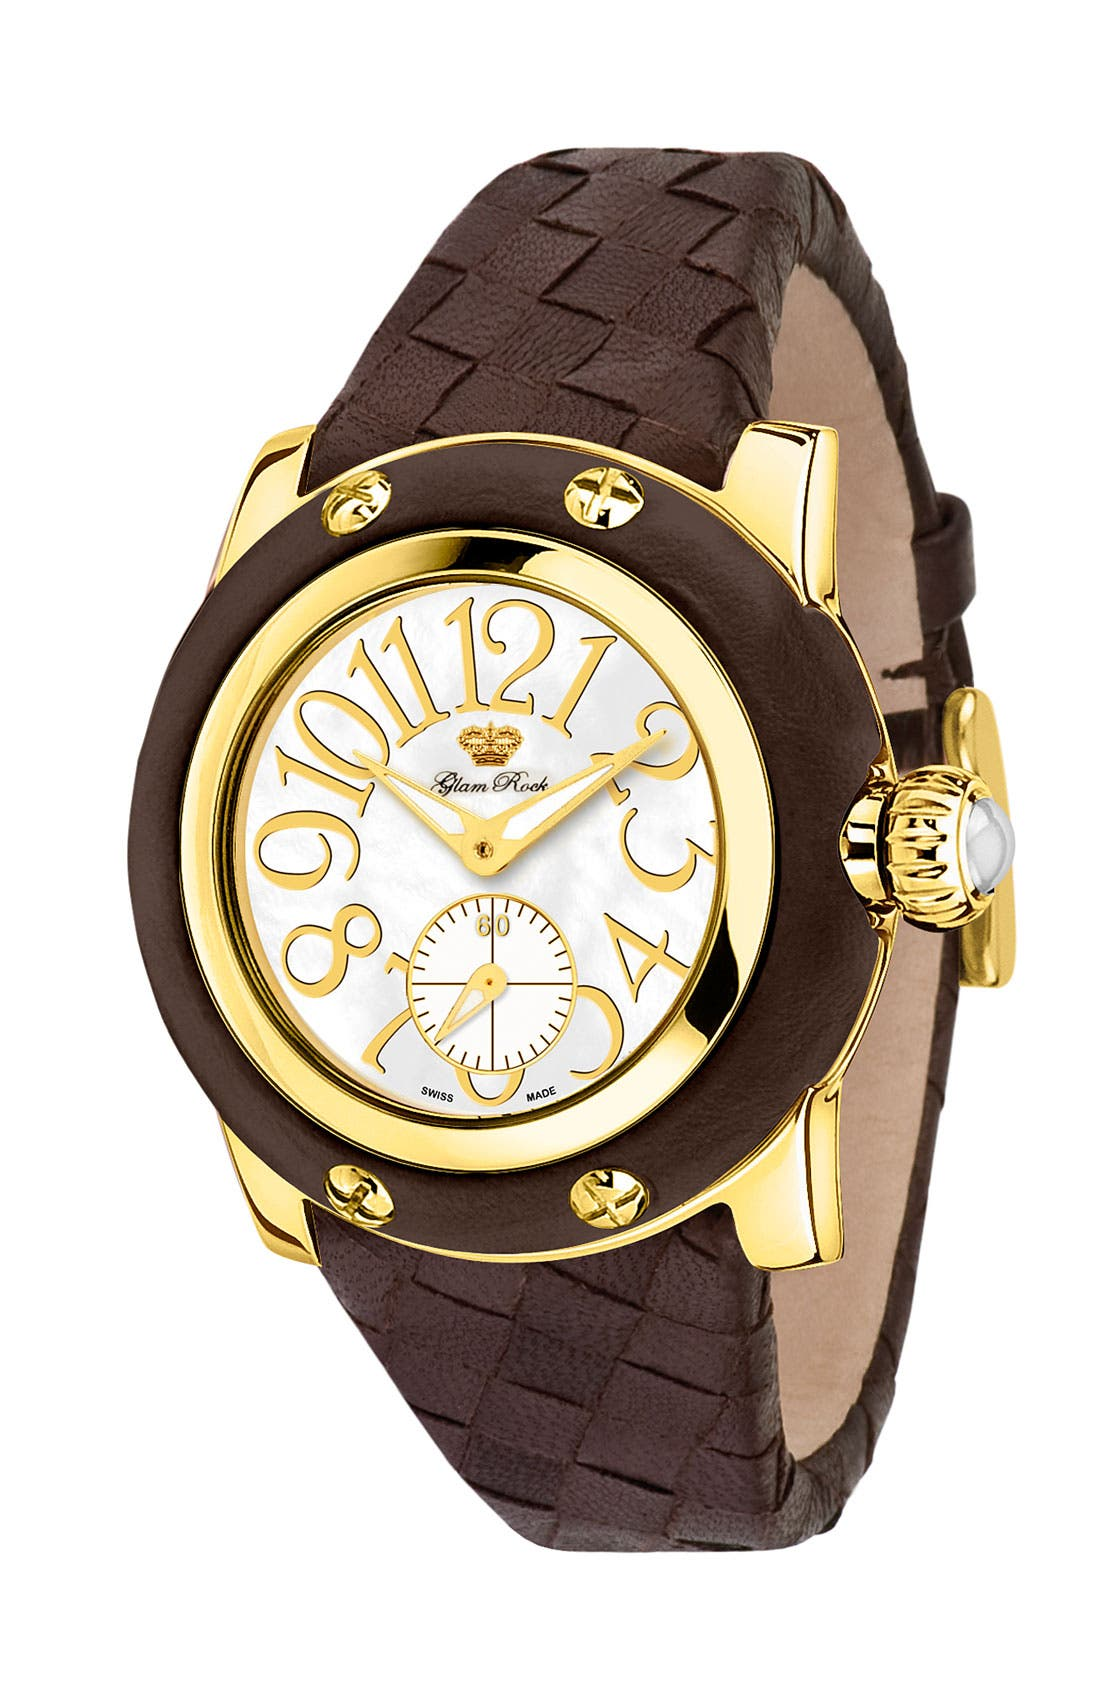 Main Image - Glam Rock 'Palm Beach' Woven Strap Watch, 40mm